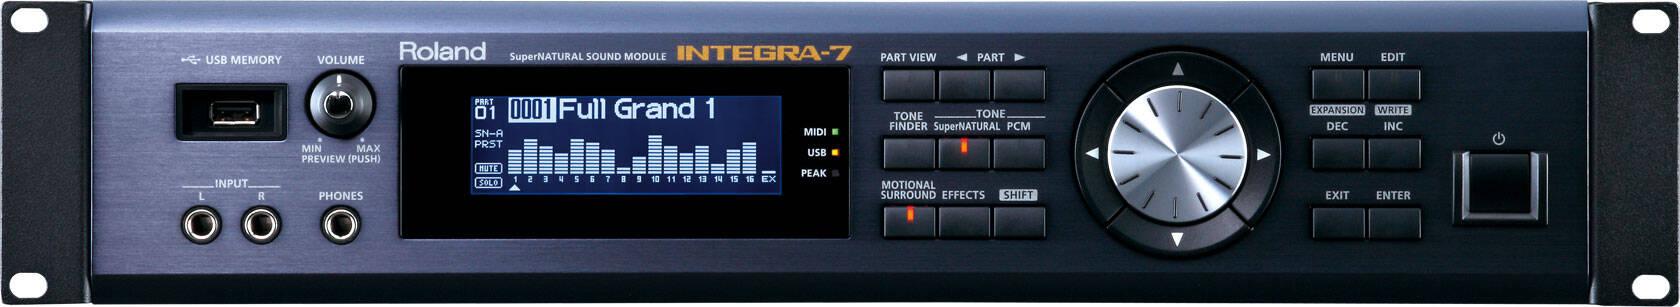 integra-7_front_gal-1